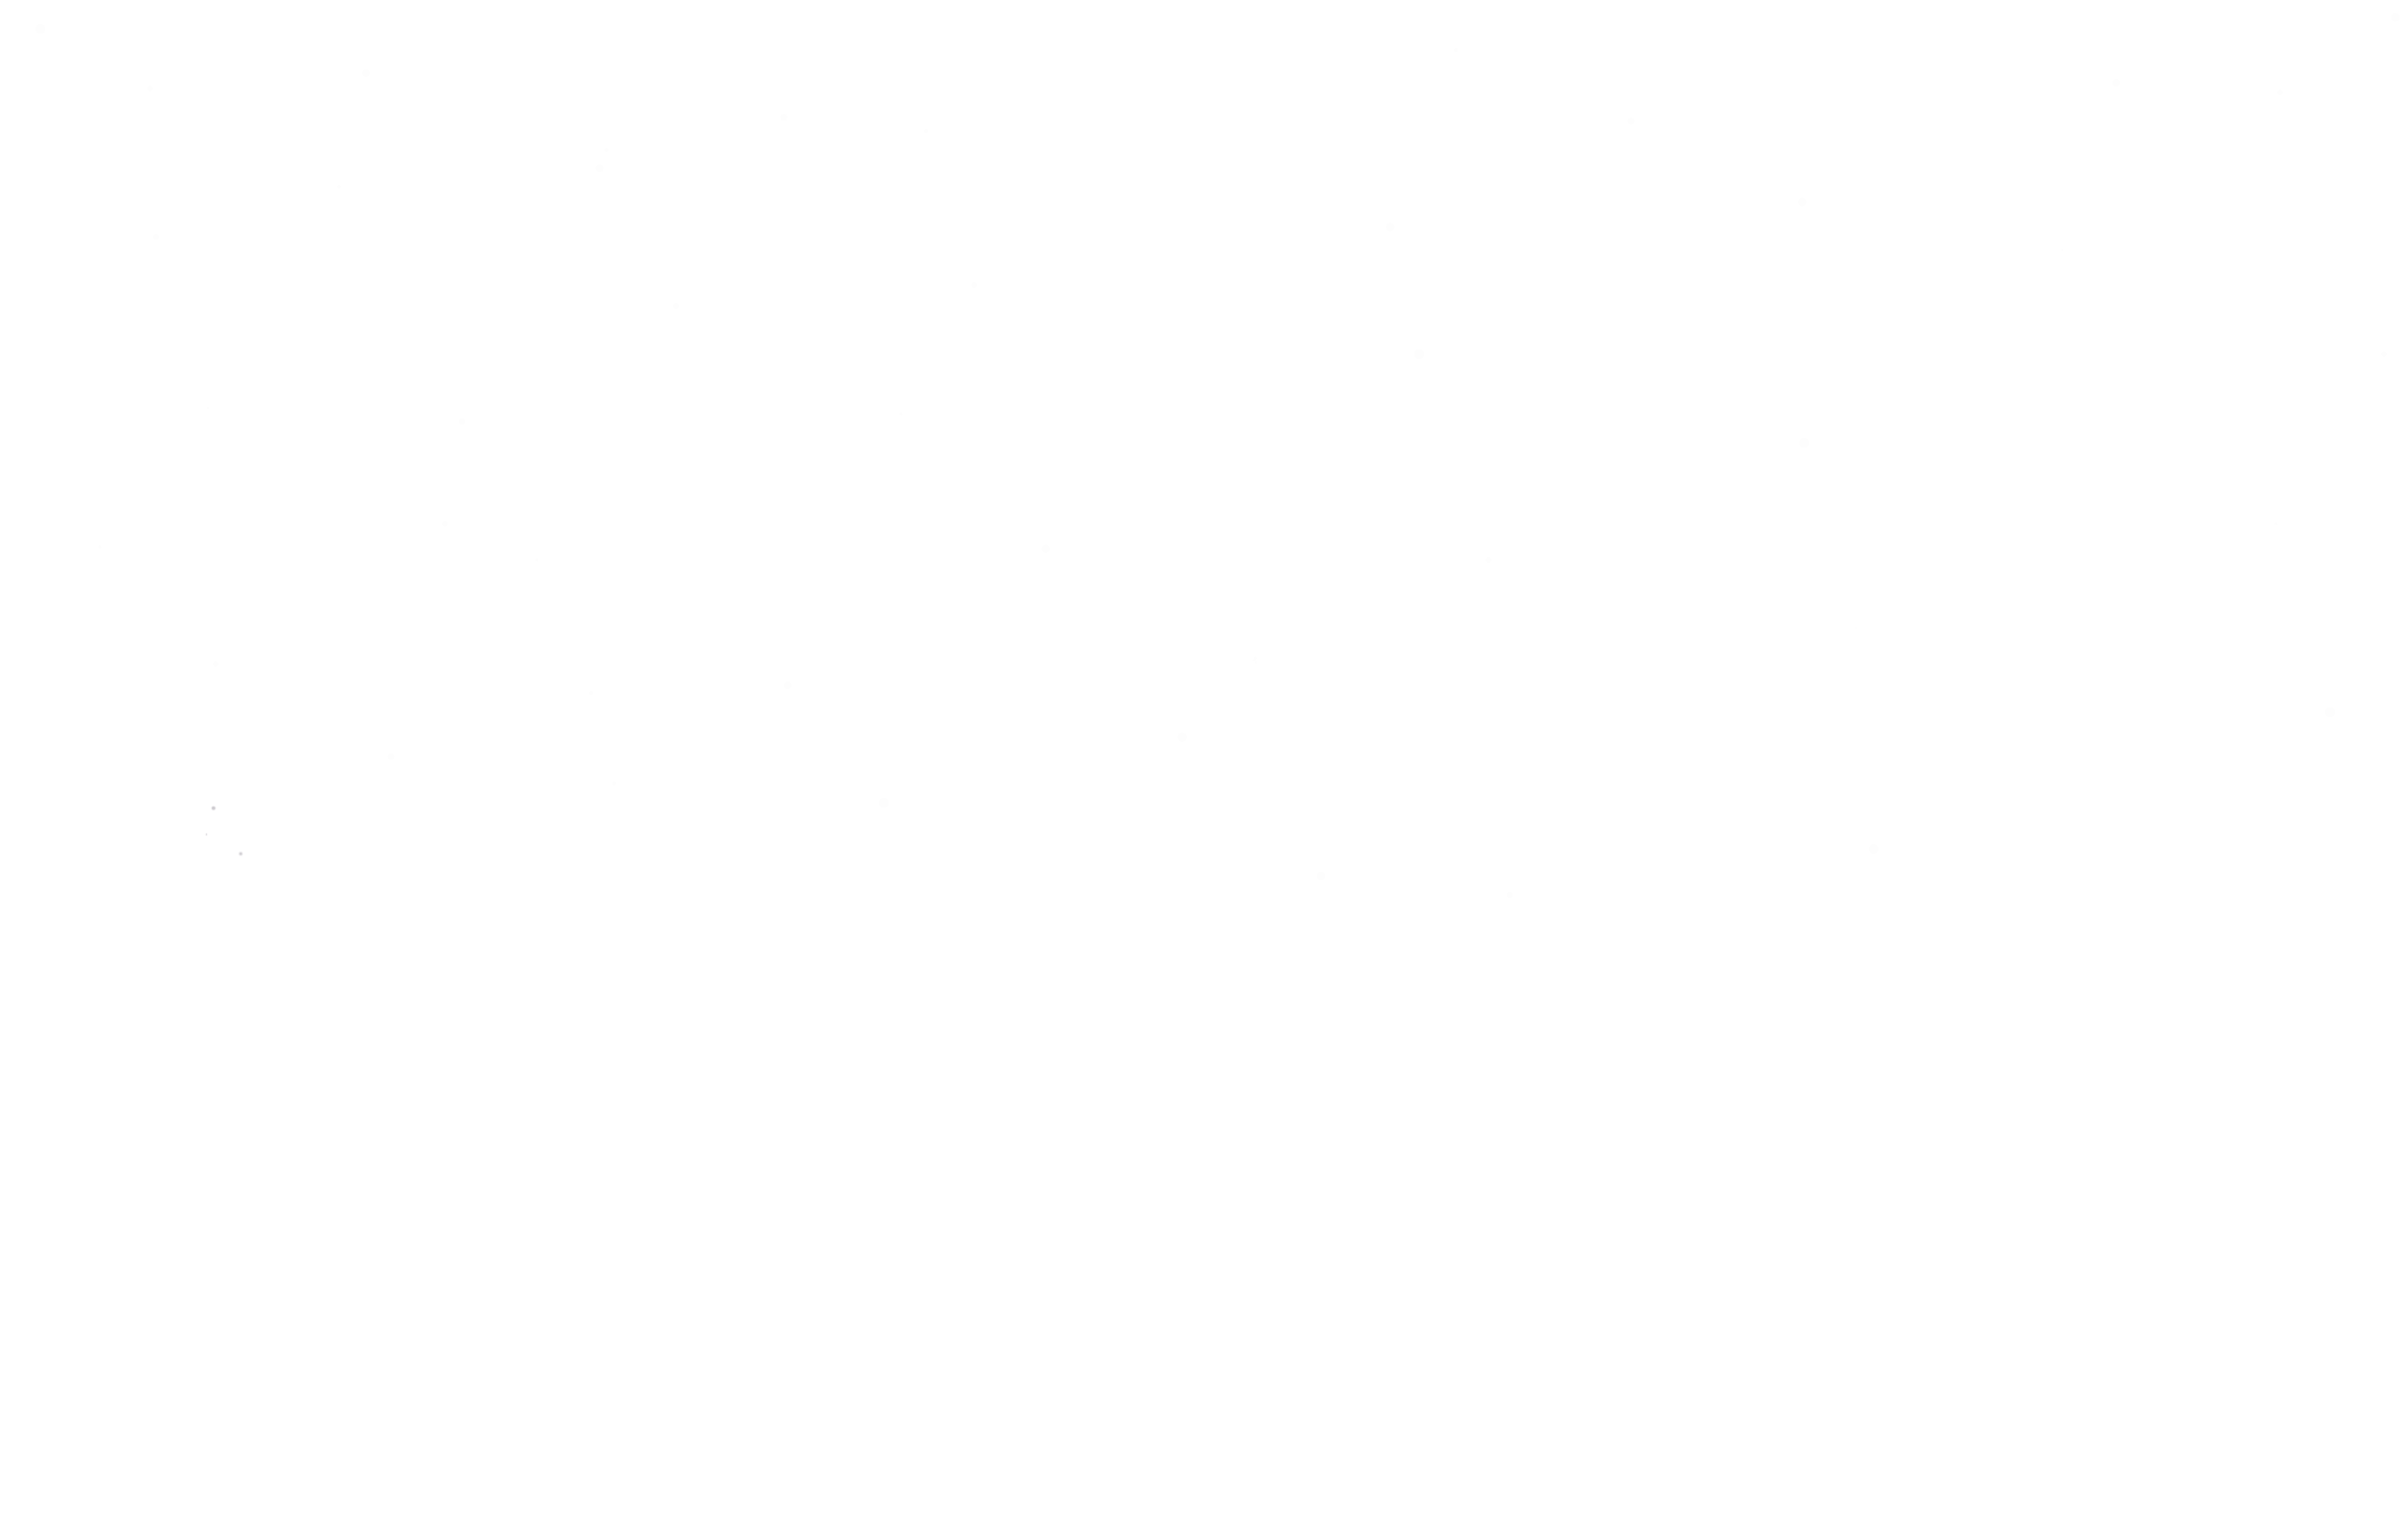 Stars - web design services